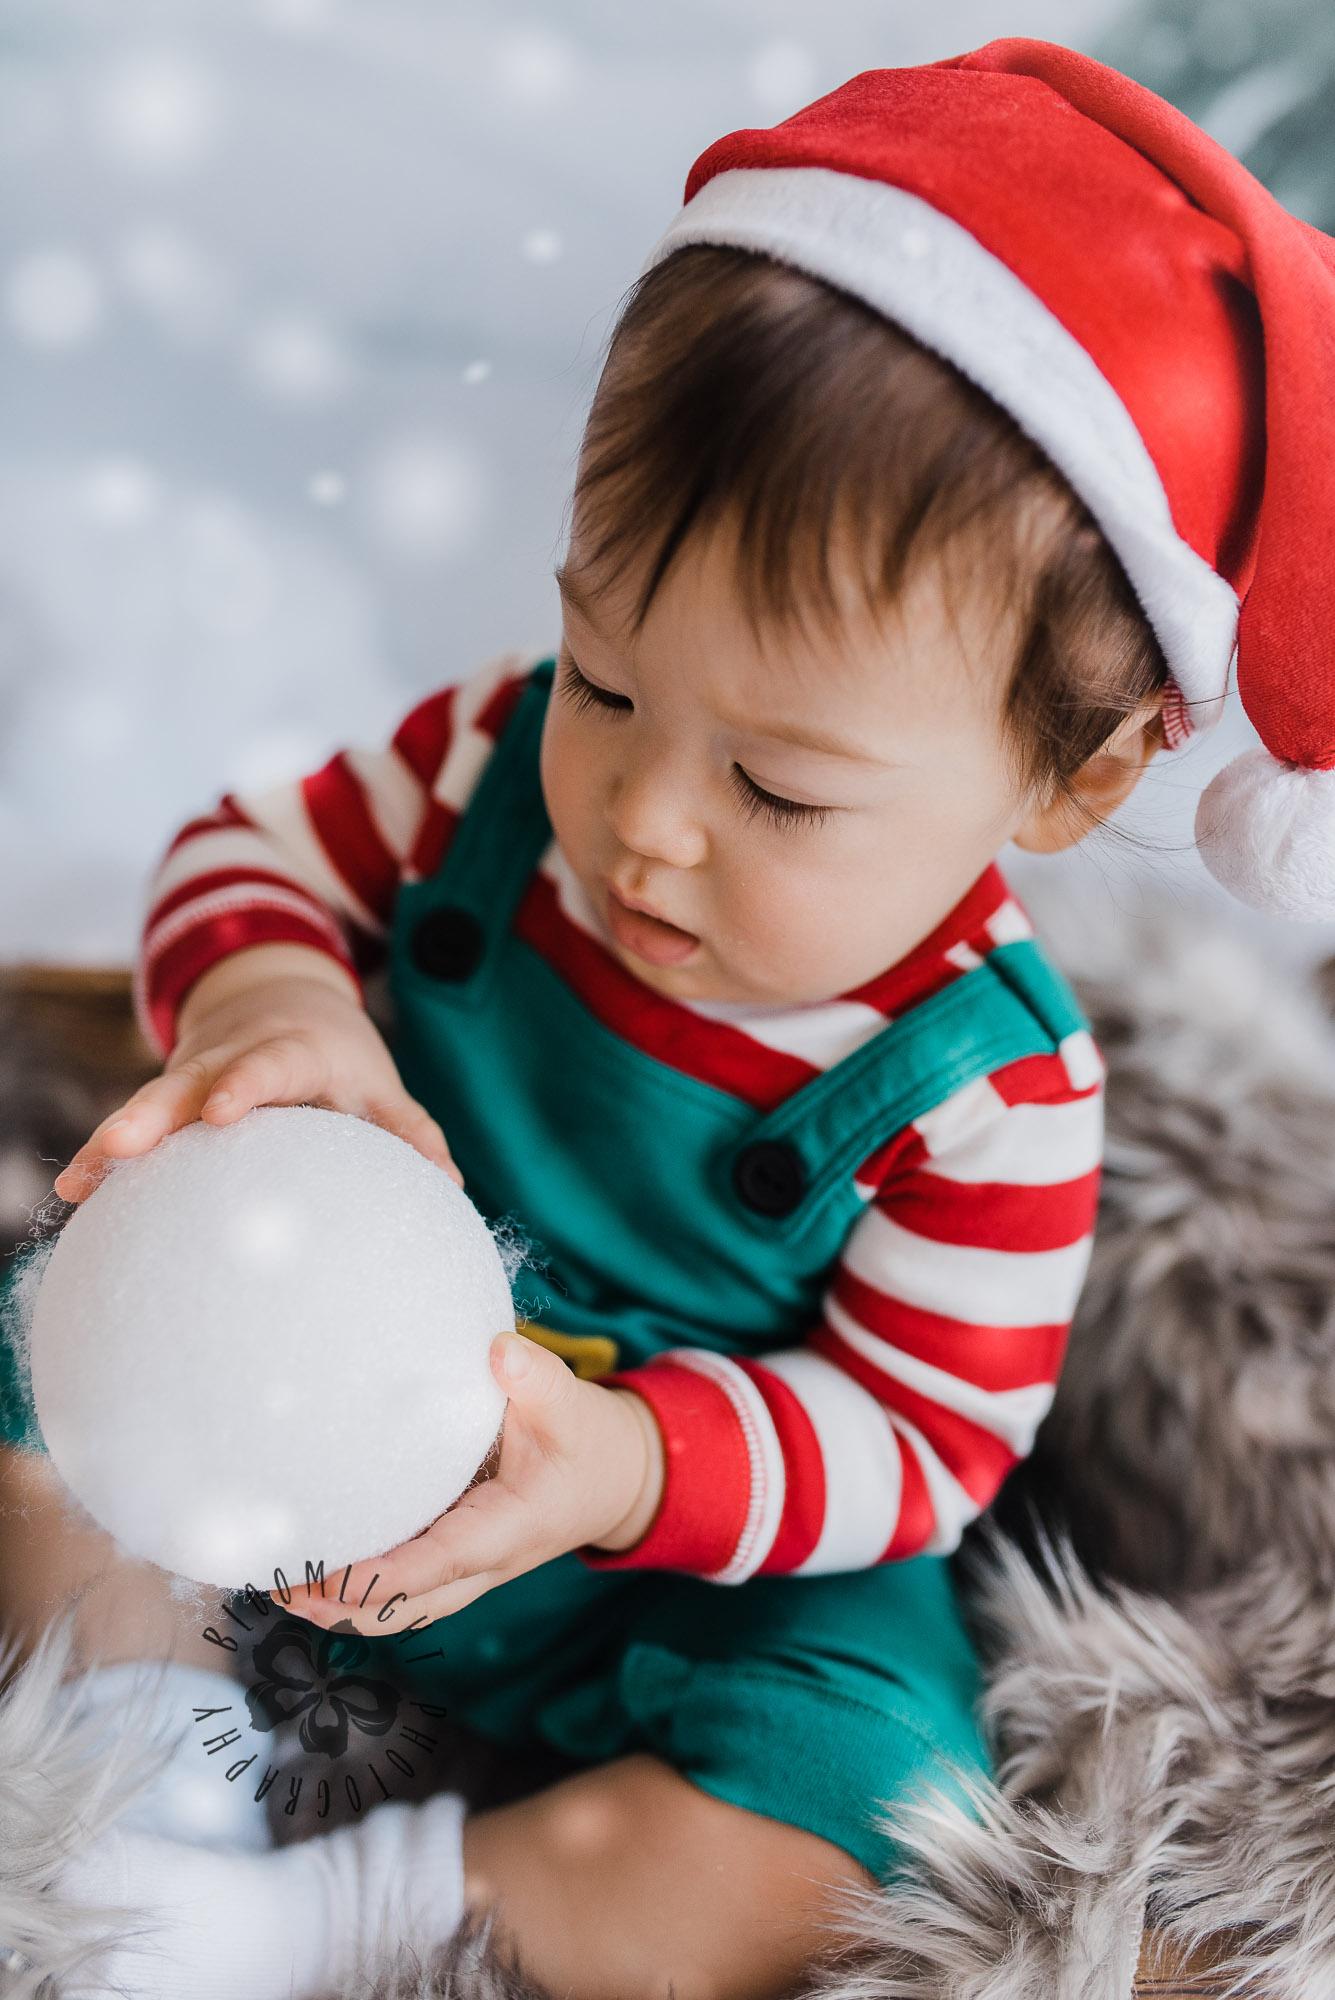 Toronto-NorthYork-Christmas-Minis-Holiday-Photographer-baby-children-kid-photo (19).jpg